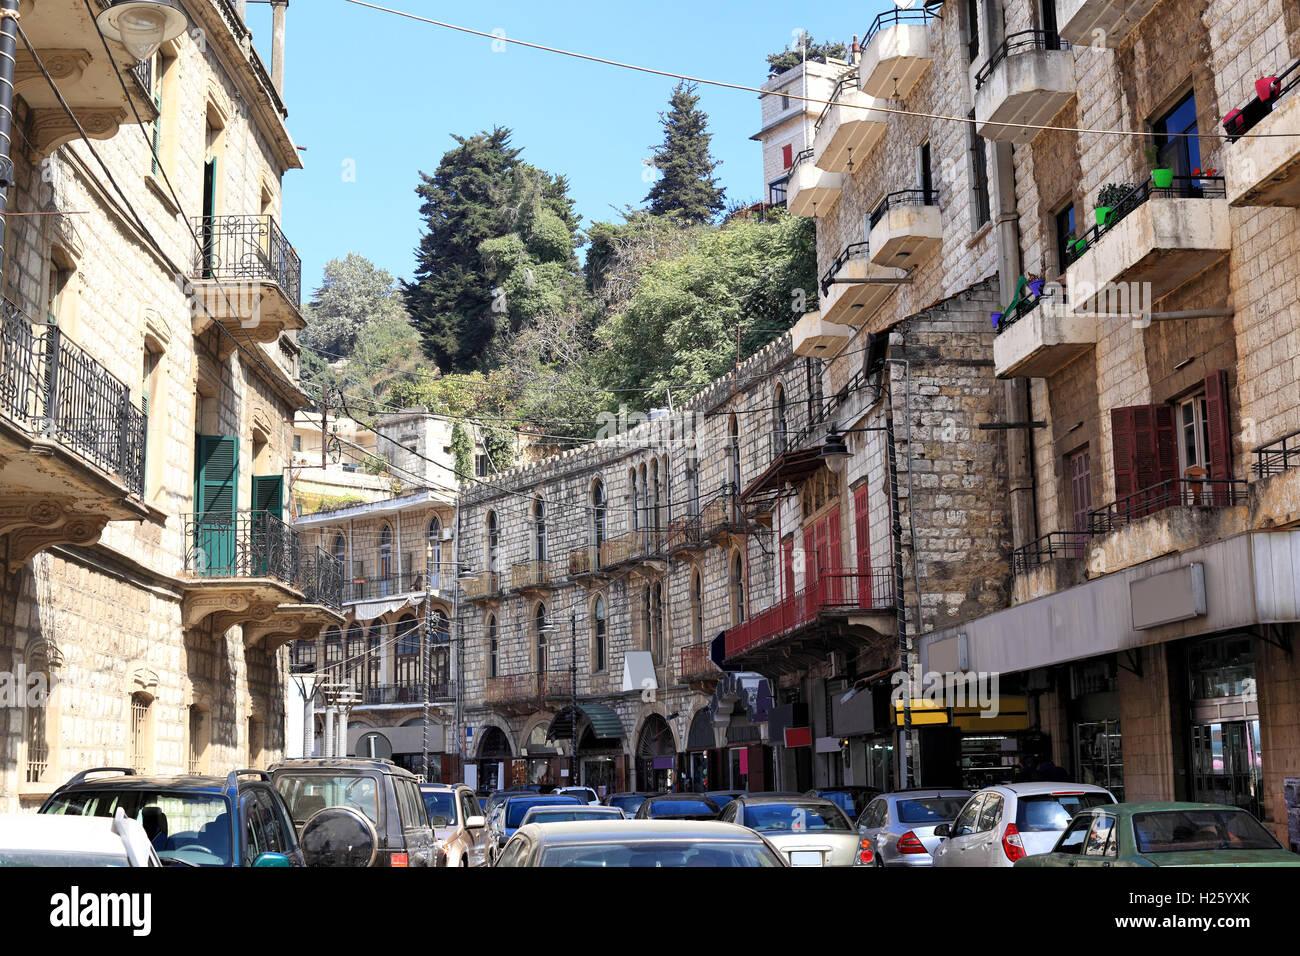 Aley souks, Lebanon - Stock Image